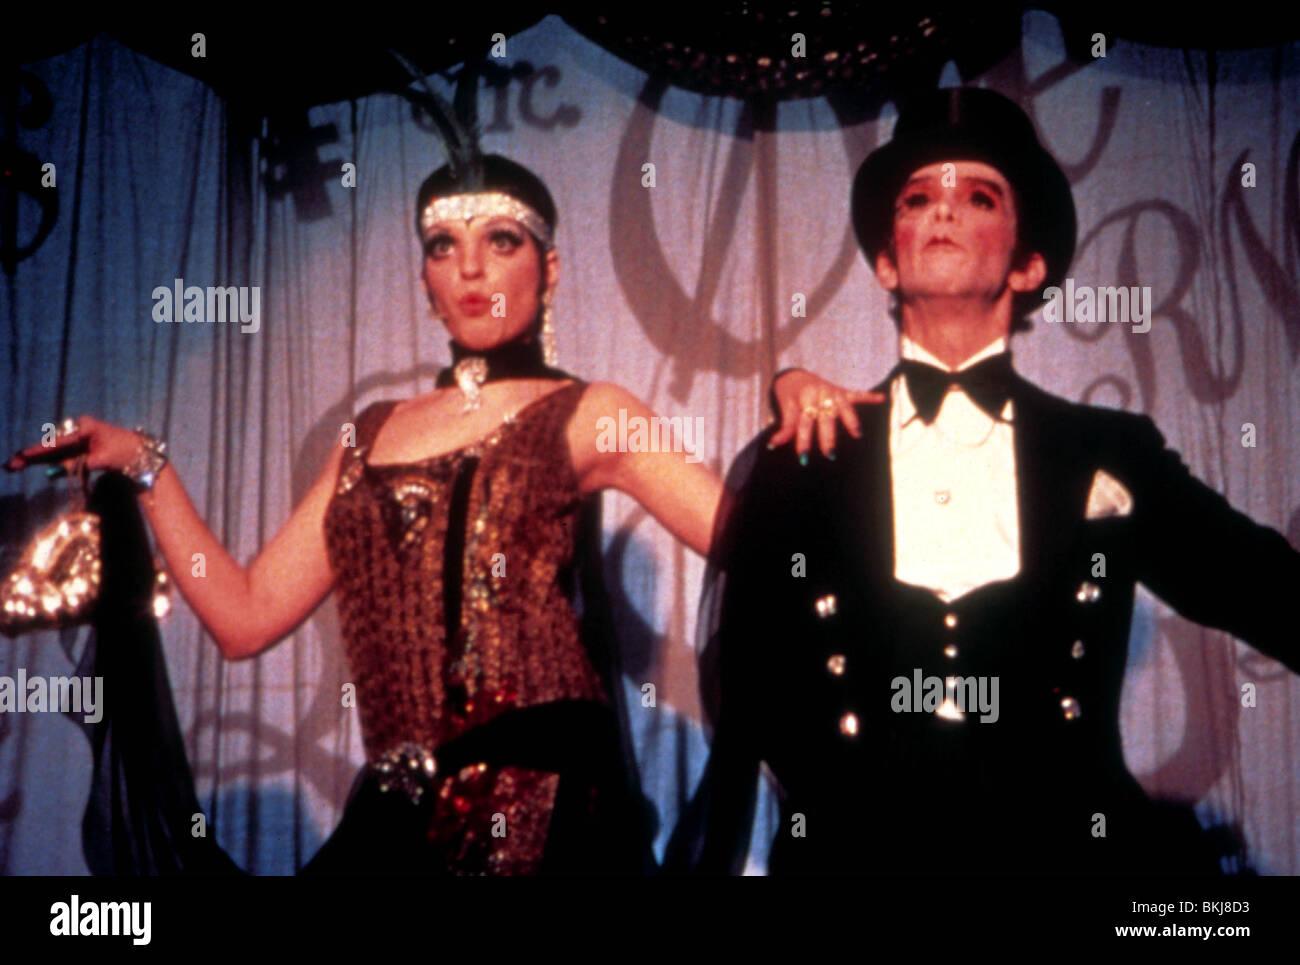 Cabaret 1972 Liza Minnelli Joel Grey Cab 023 Stockfoto Bild